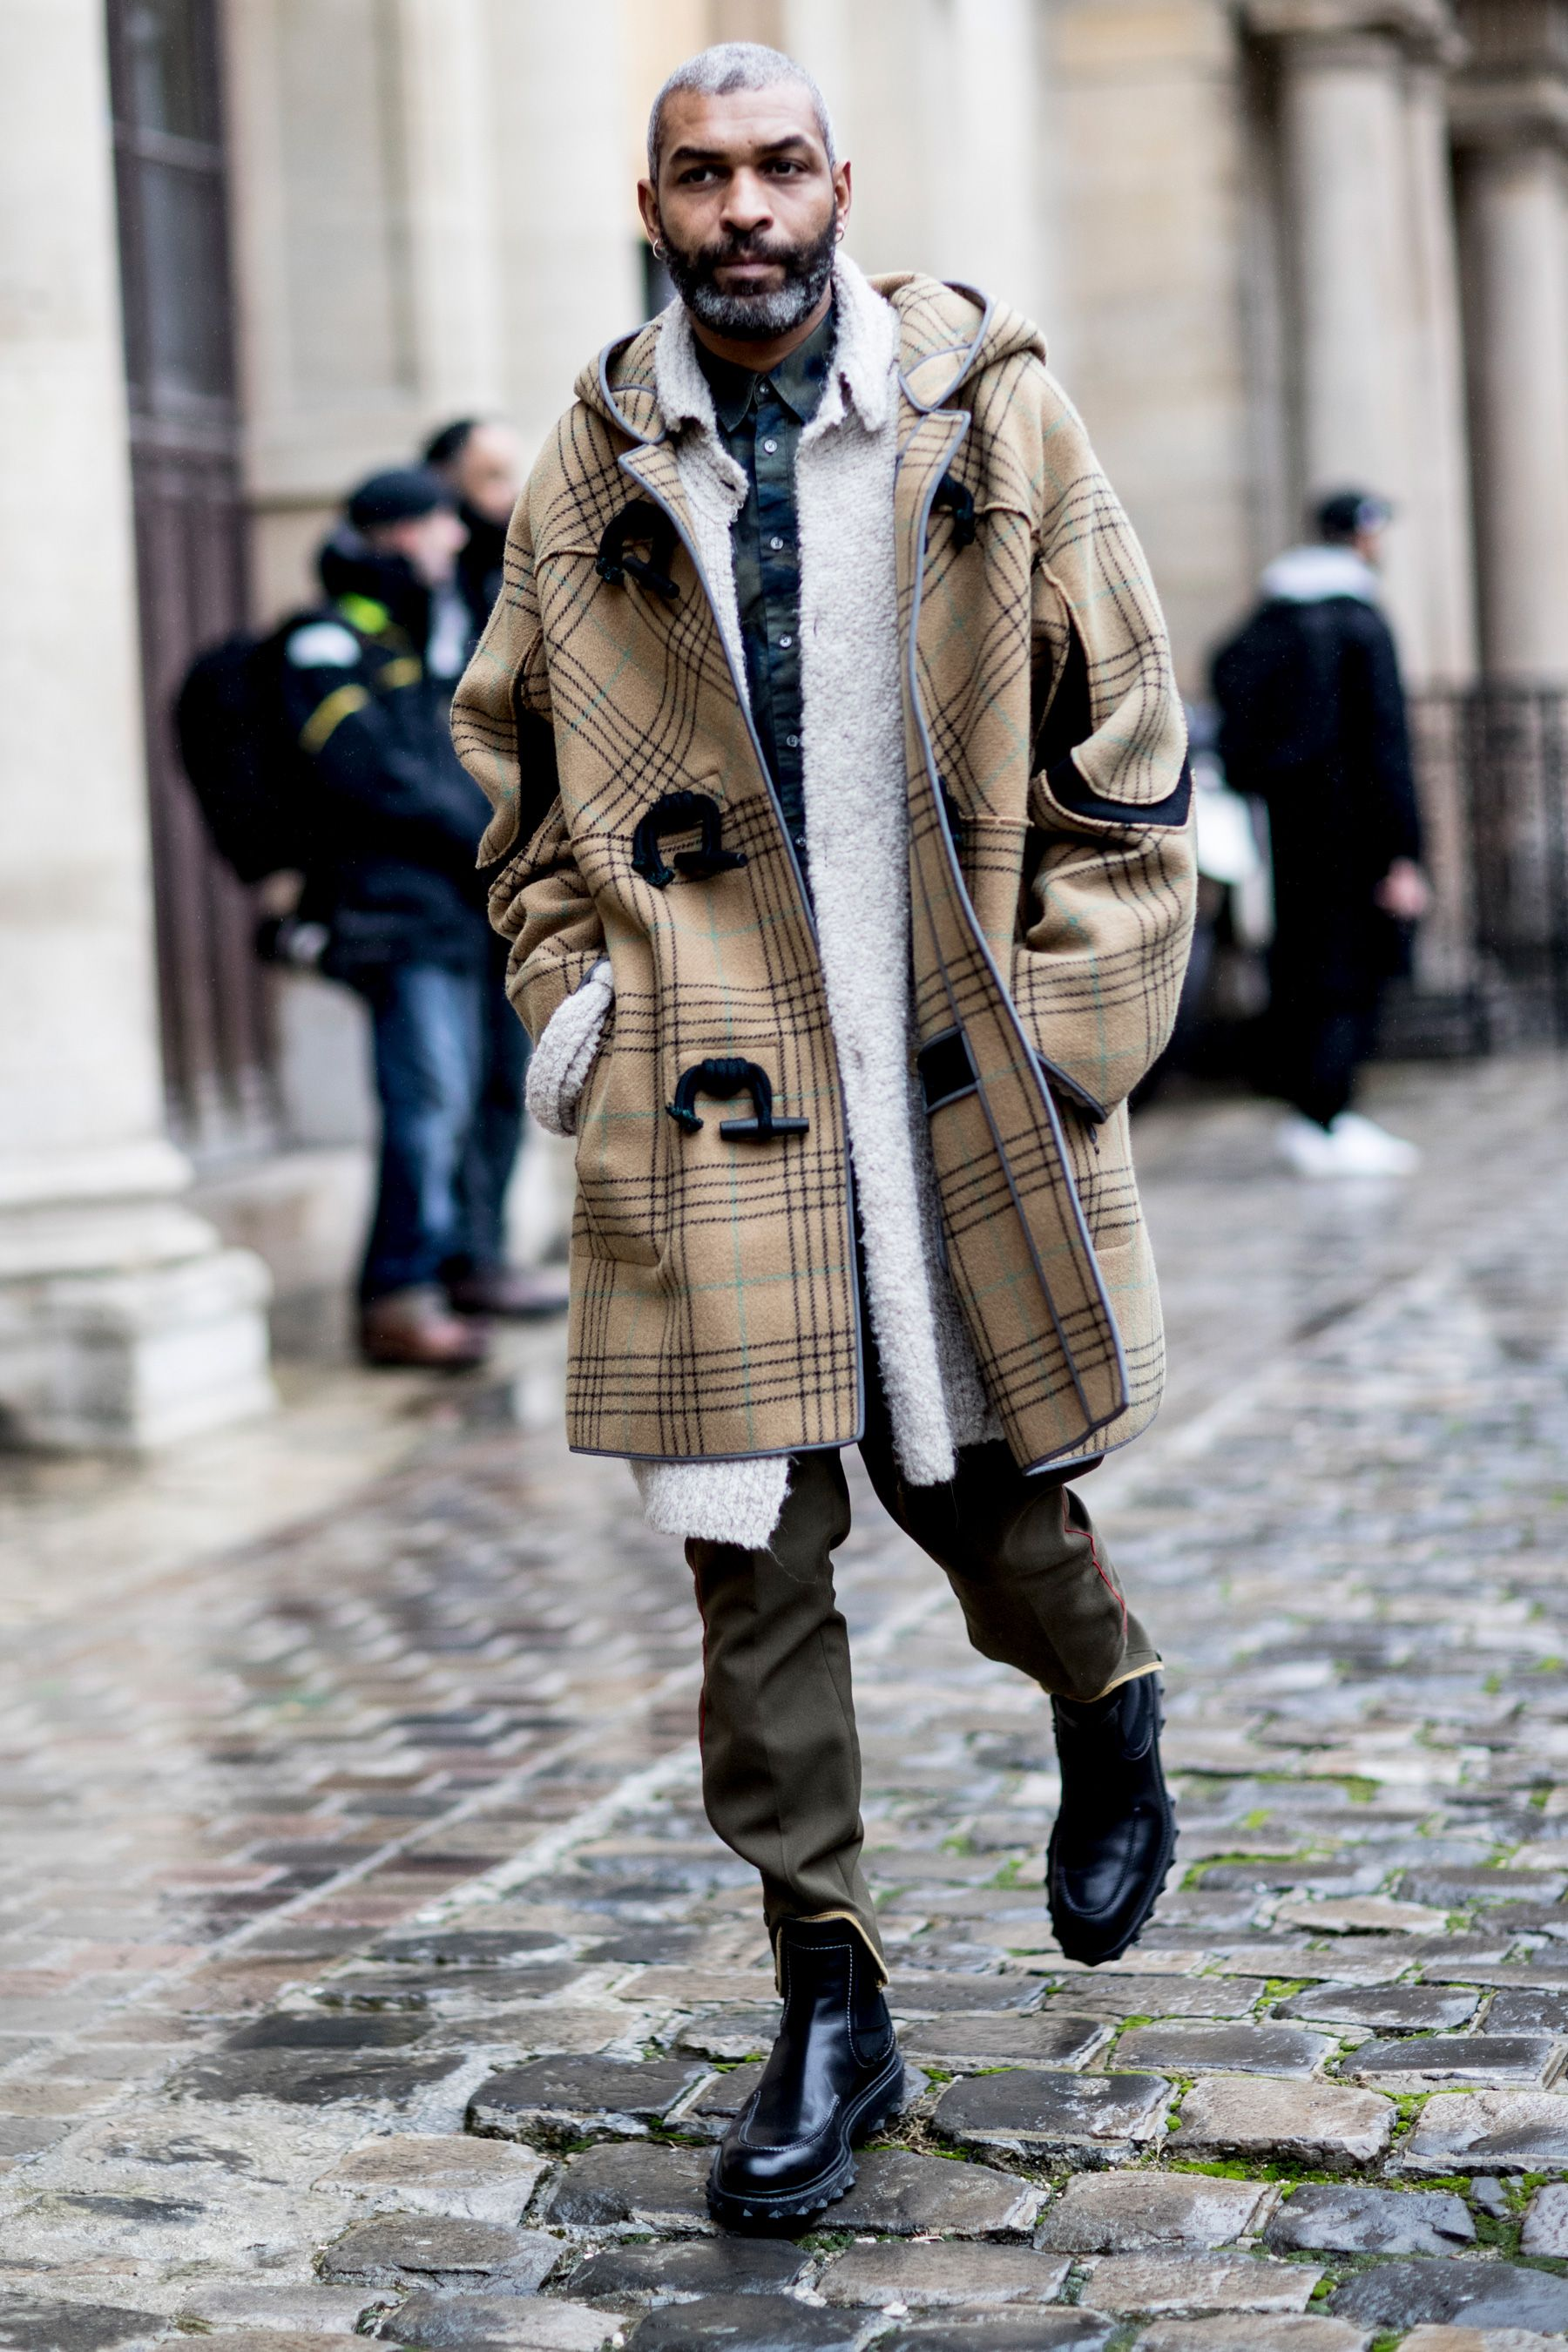 2018 Men S Thanksgiving Outfits 30 Ways To Dress On: Paris Fashion Week Men's Street Style Fall 2018 Day 4